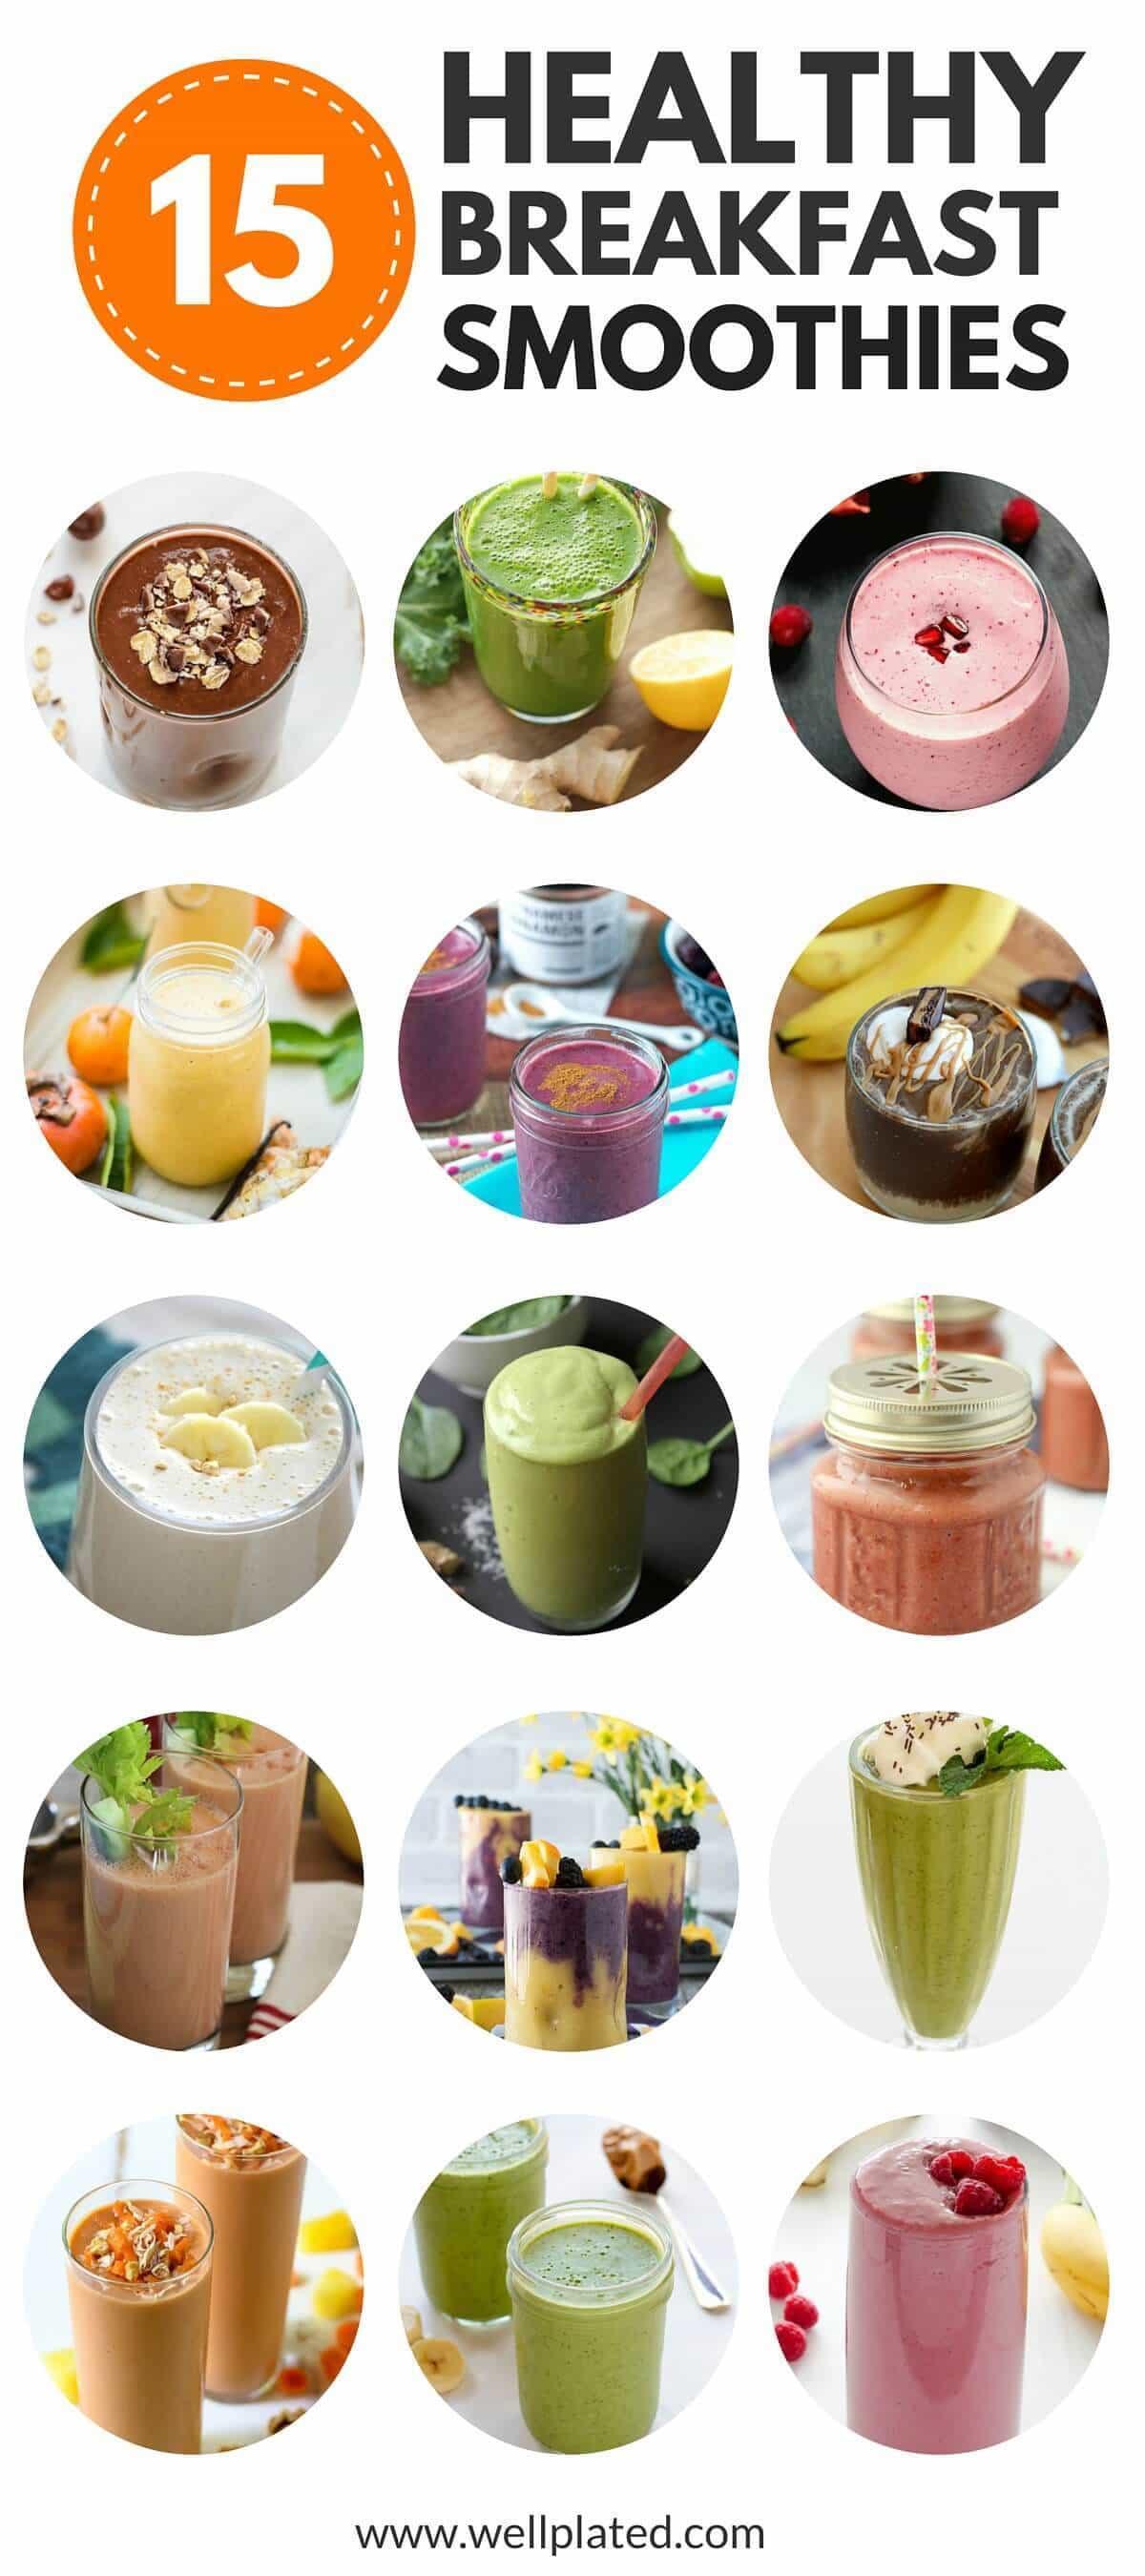 Healthy Breakfast Smoothies  The Best 15 Healthy Breakfast Smoothies